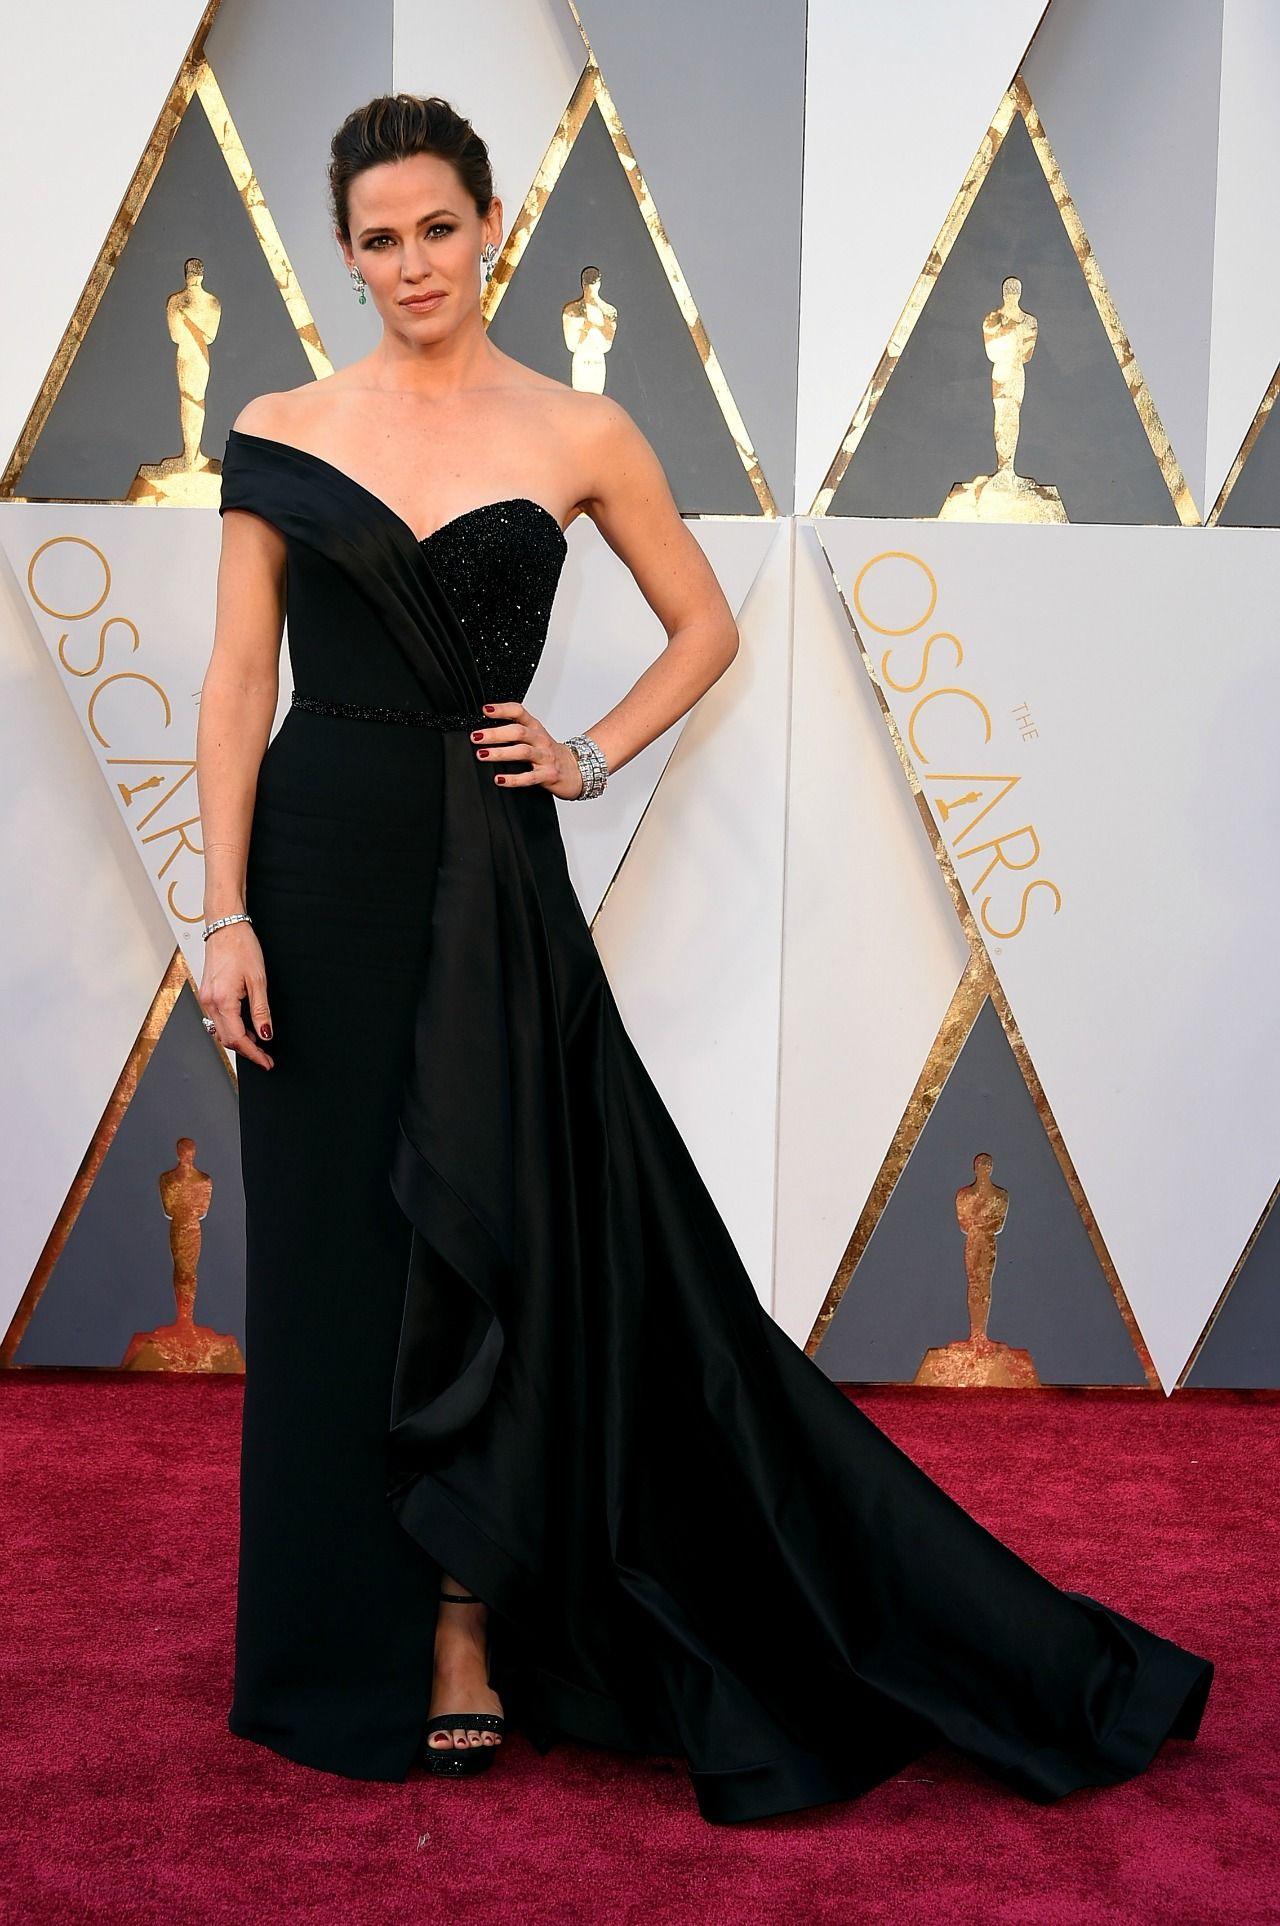 Jennifer Garner Absolutely Stuns In Oscars Dress After Ben Affleck Vanity Fair Tell All Celebrity Dresses Oscars Red Carpet Dresses Oscar Dresses